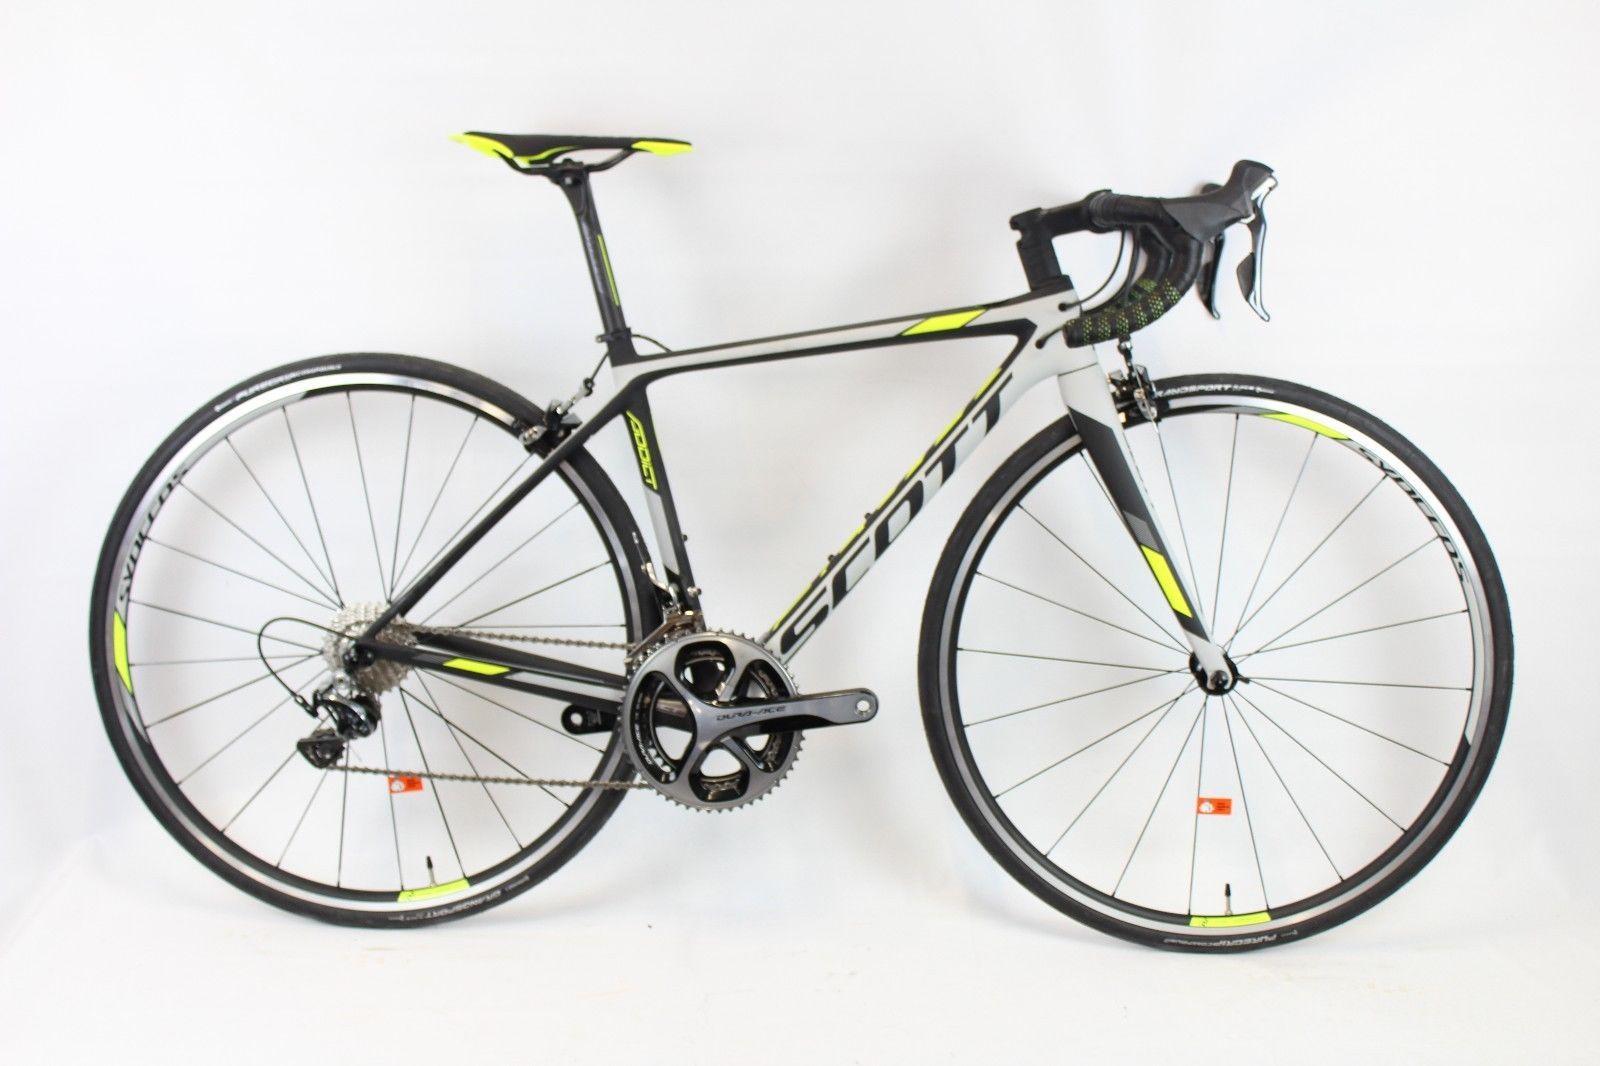 c6dd3a585b6 2017 Scott Addict 10 Carbon Fiber Dura Ace 9000 Road Bike XXS 47cm #roadbike